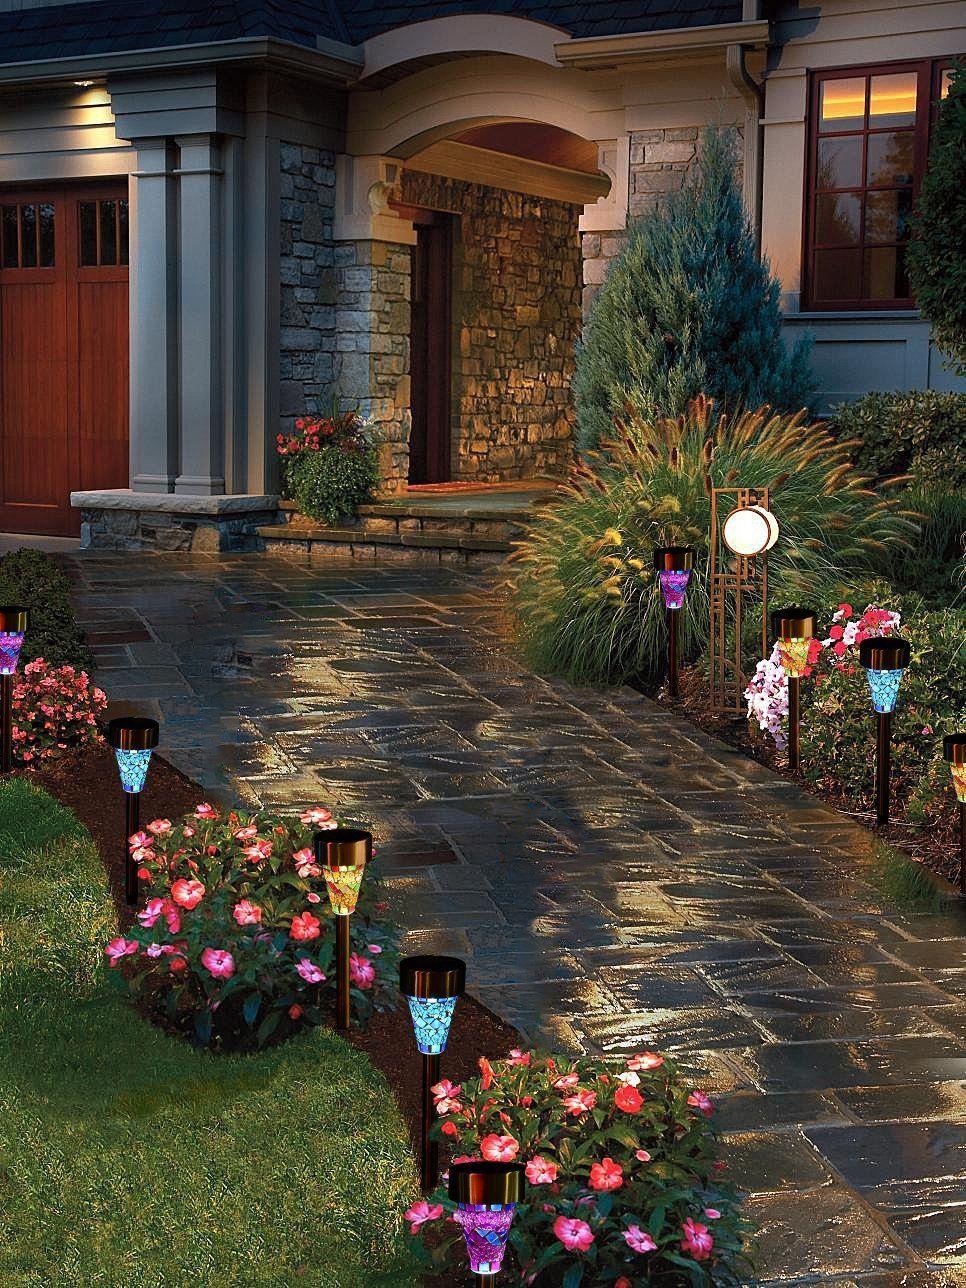 Led Solar Outdoor Garden Lights - 3 Color Mosaic Stake Landscape ...